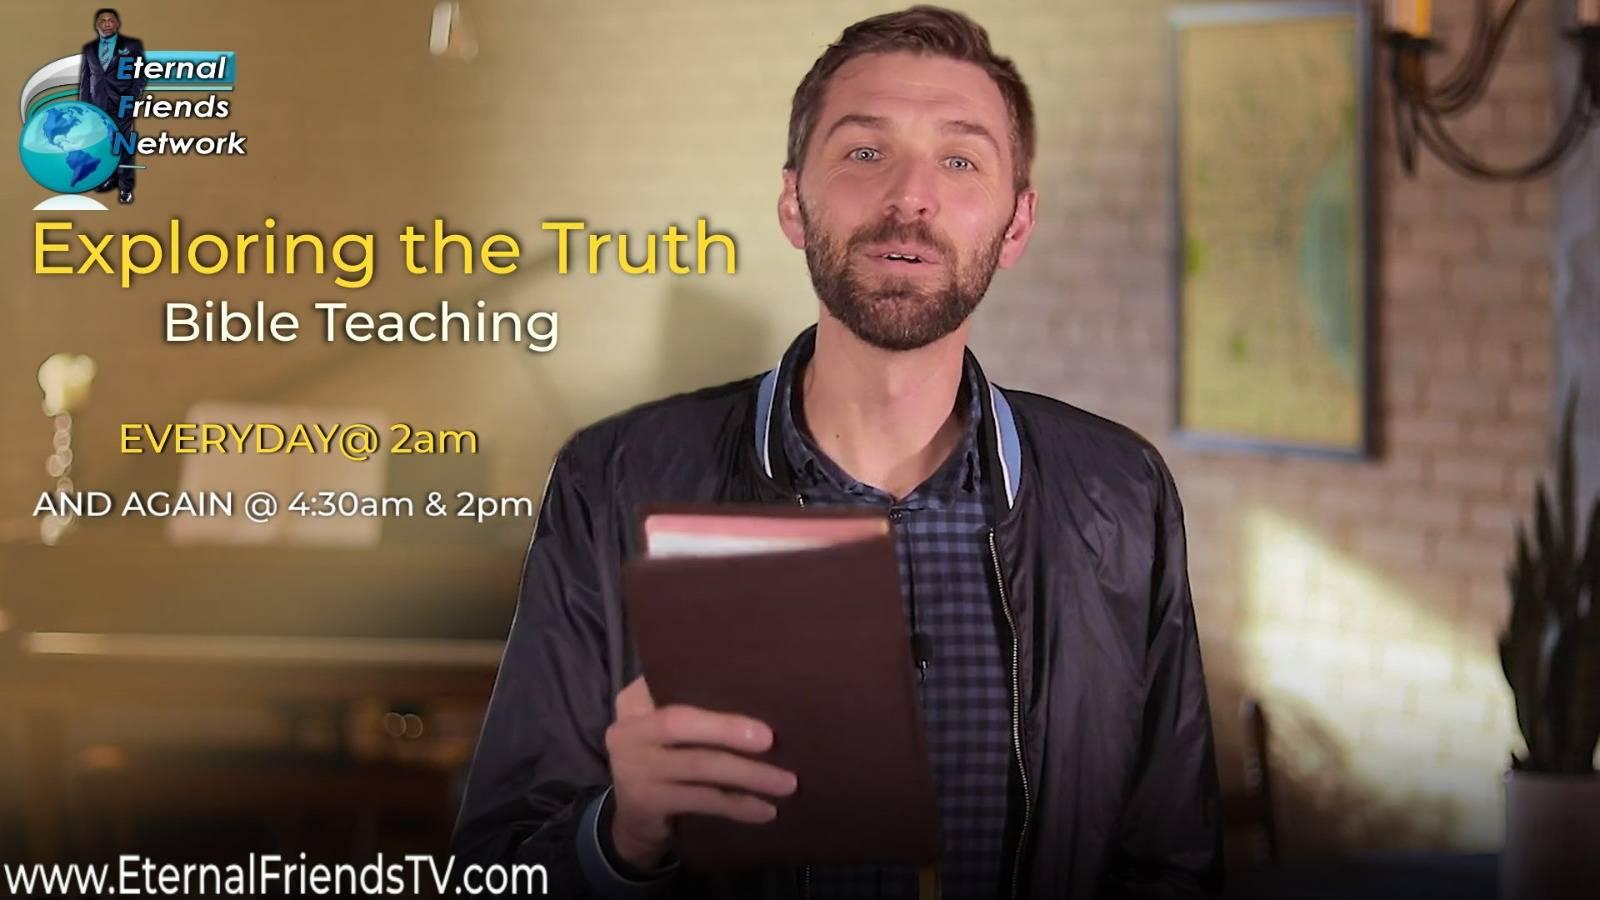 Exploring the Truth Bible Teaching